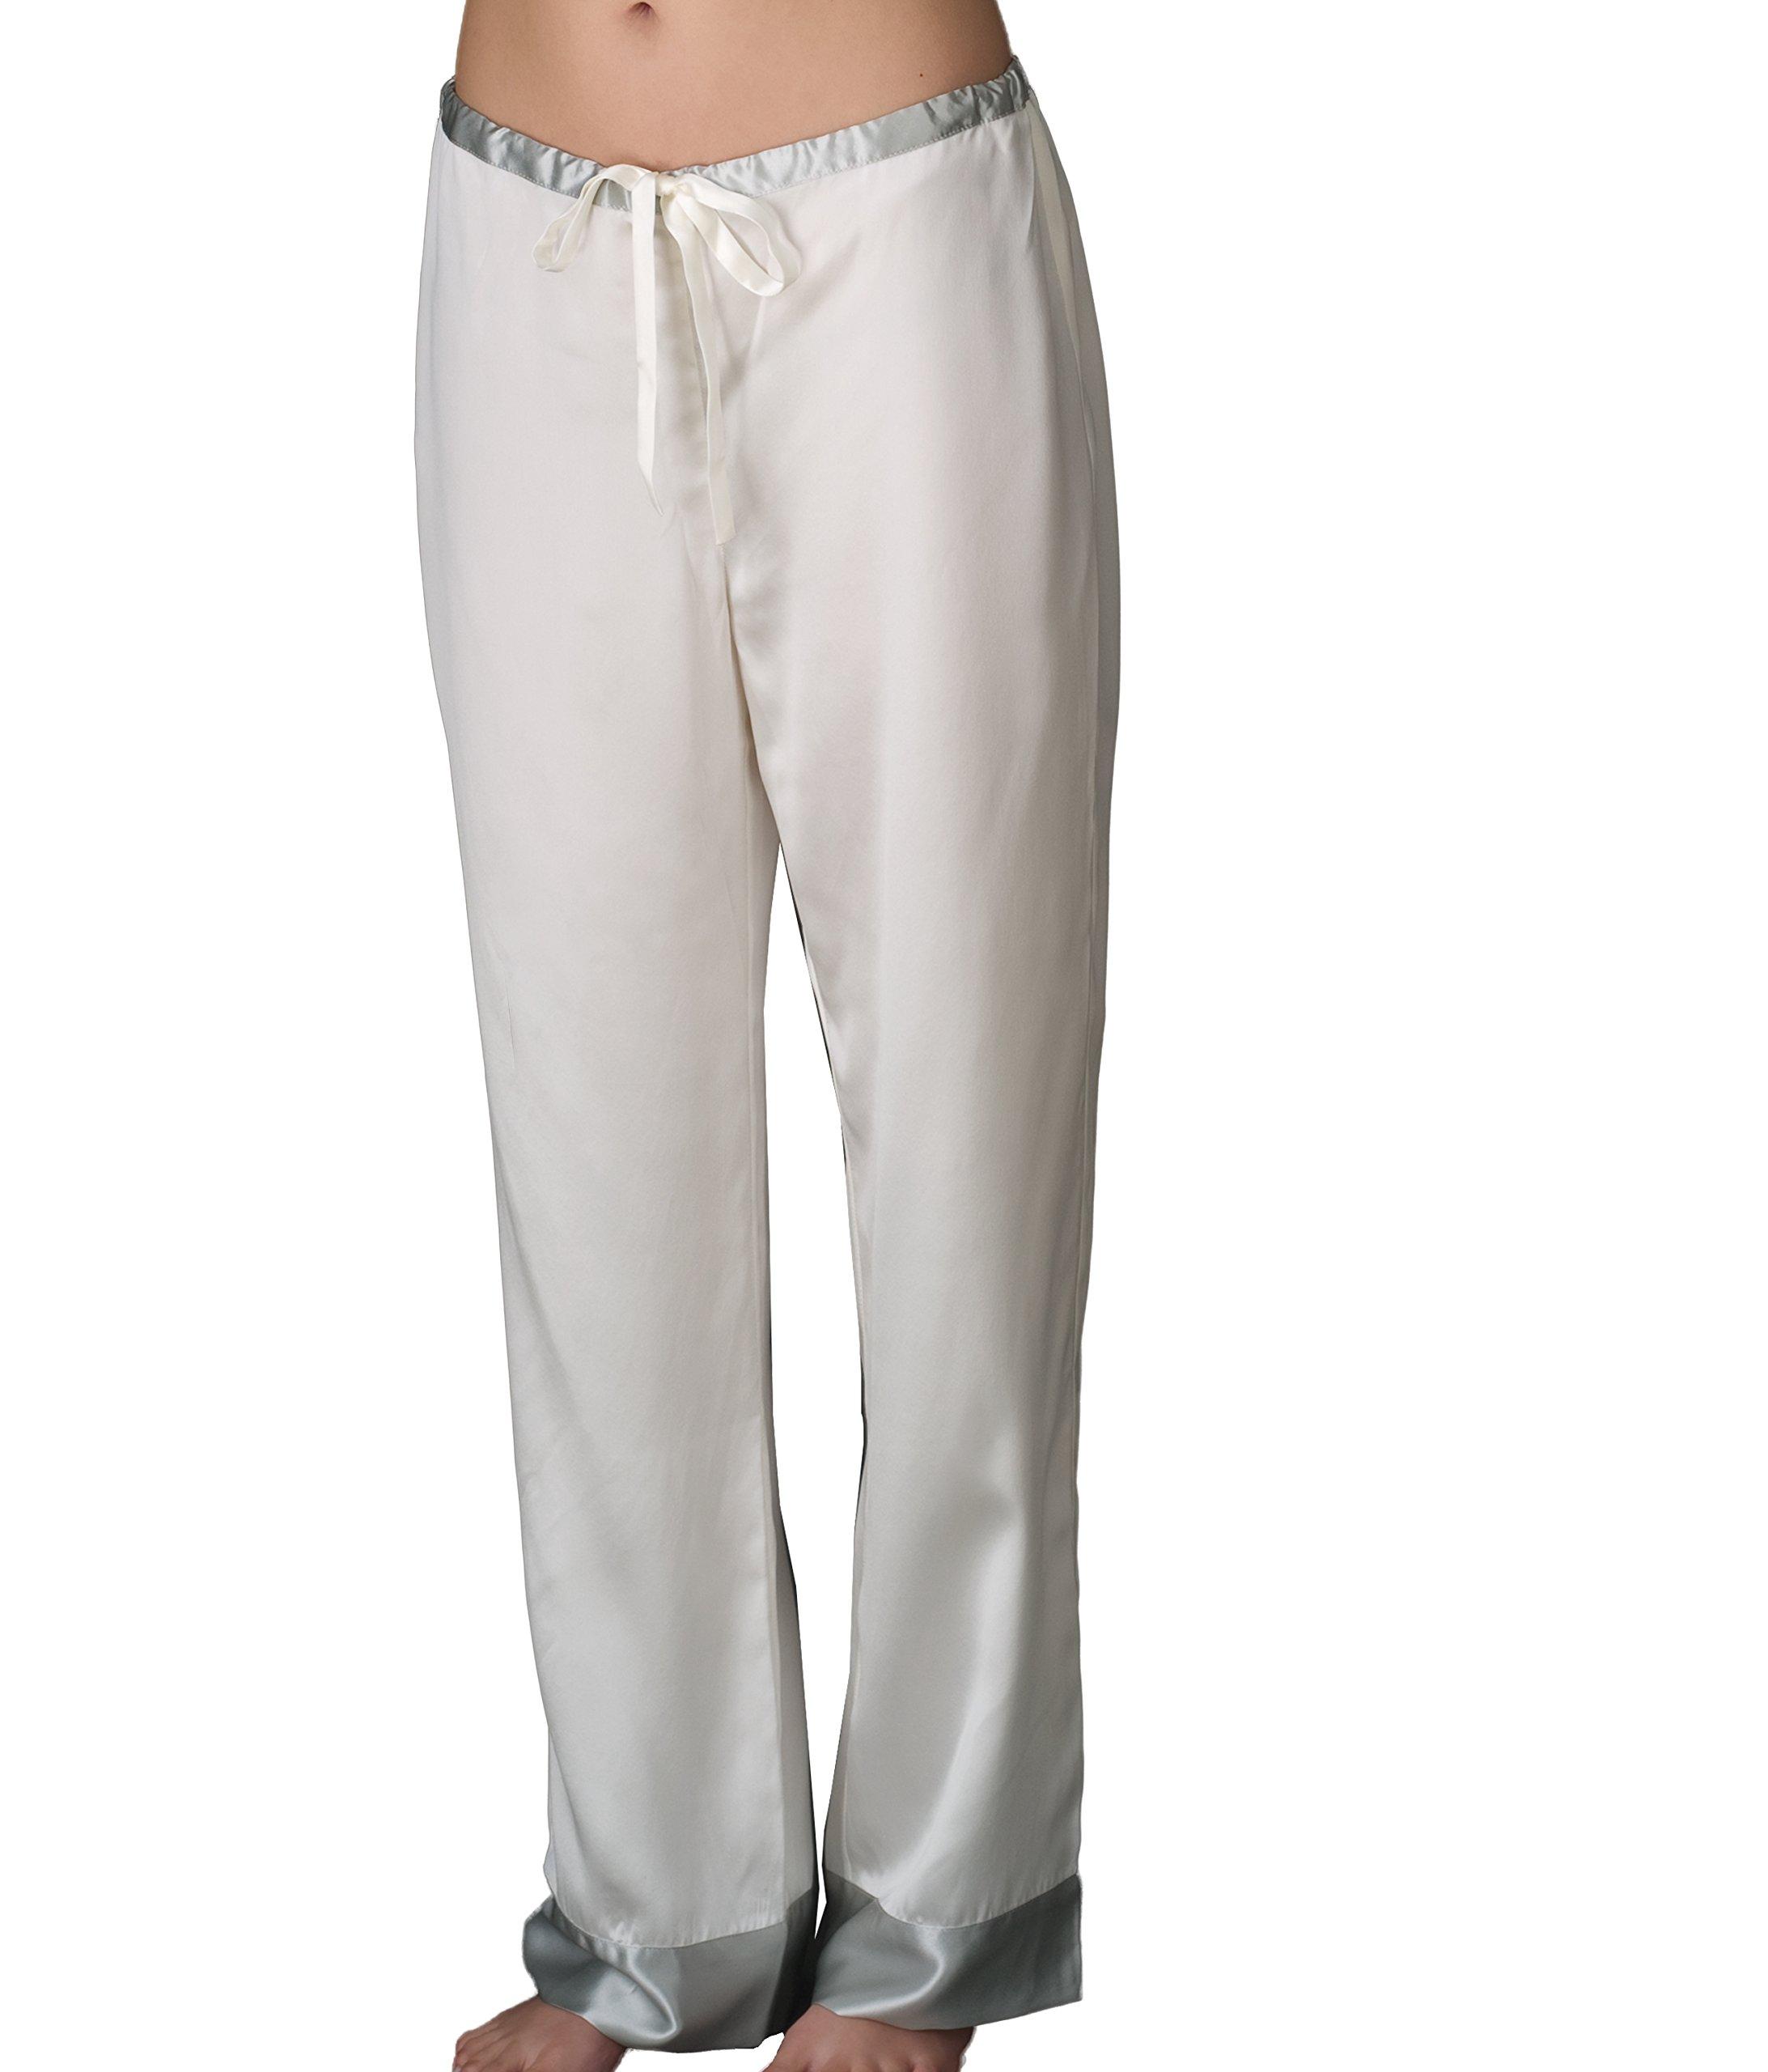 Julianna Rae Women's 100% Silk Pajama, Classic Fit, Evening Lounge, Alabaster, Petite, M by Julianna Rae (Image #3)